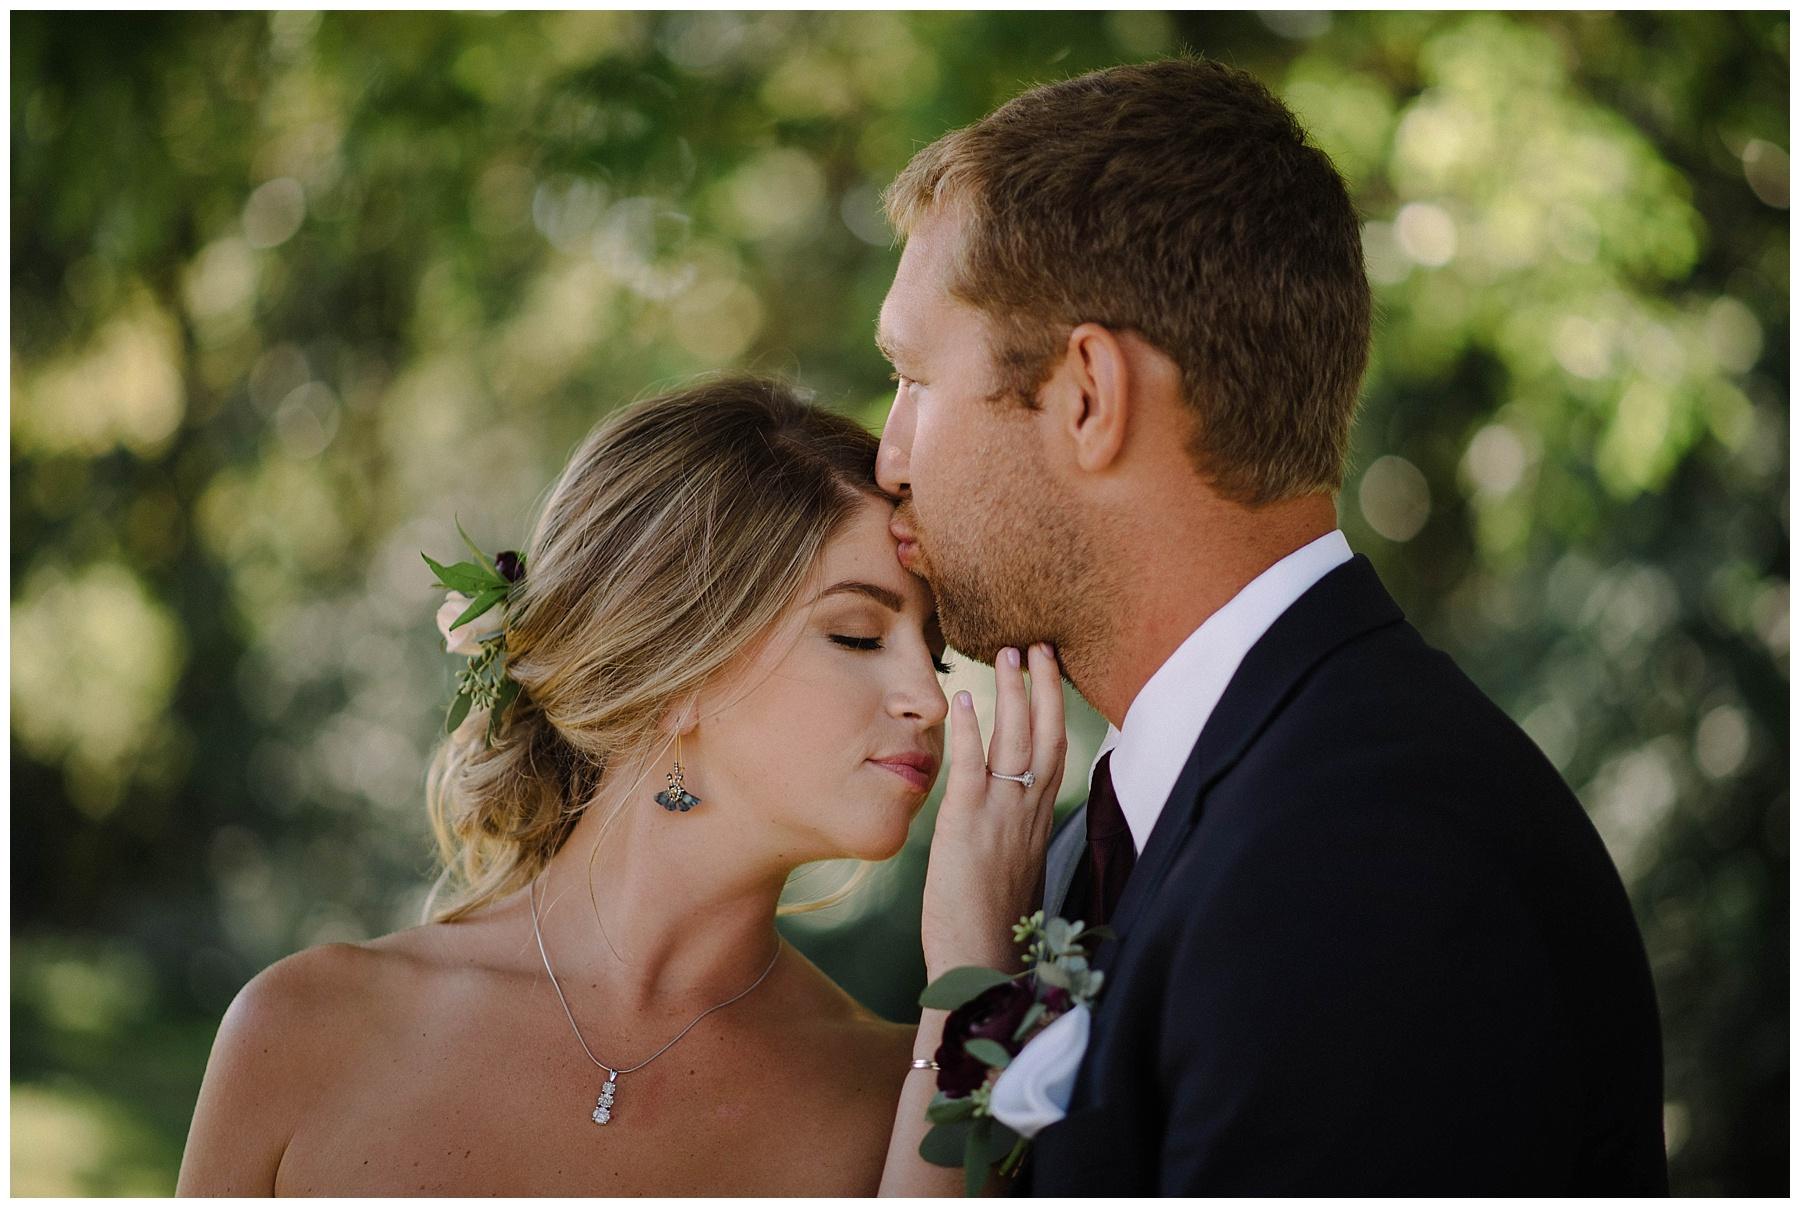 F Central Wedding KyleDevynOutdoor otography Summer Lauren MzqSpGVU